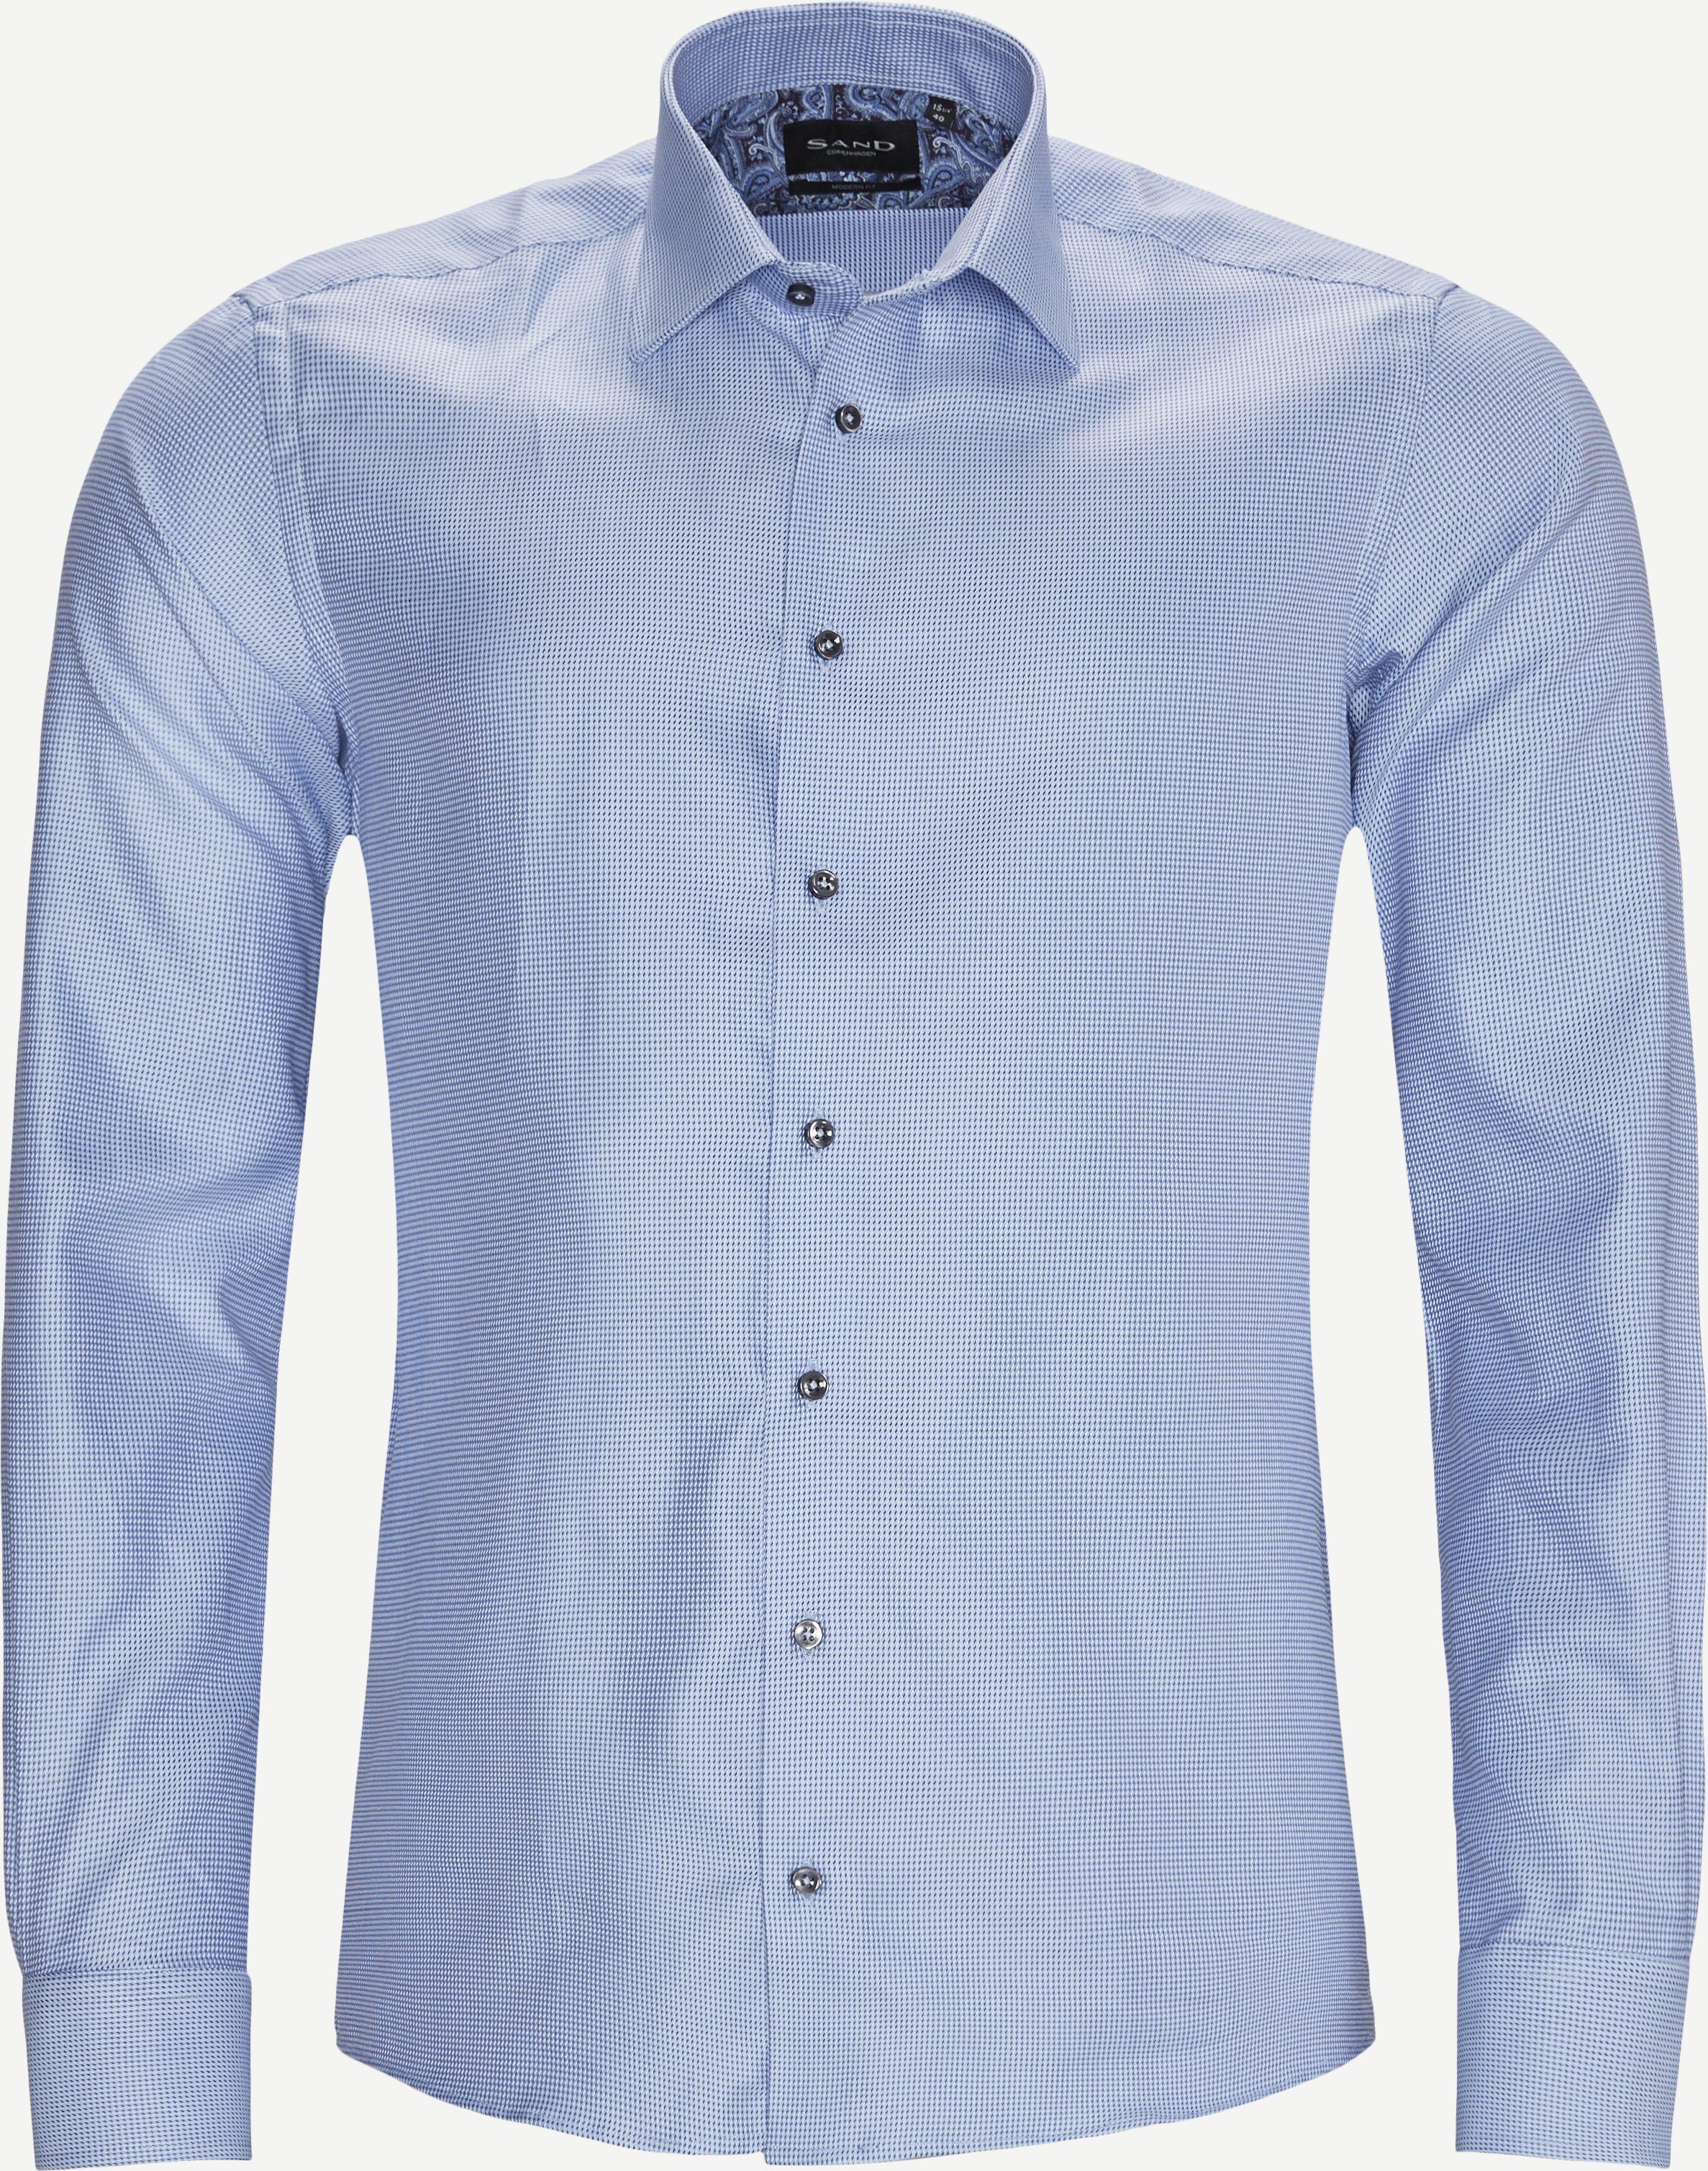 8725 Iver 2 Trim/State N 2 Trim Skjorte - Skjorter - Blå